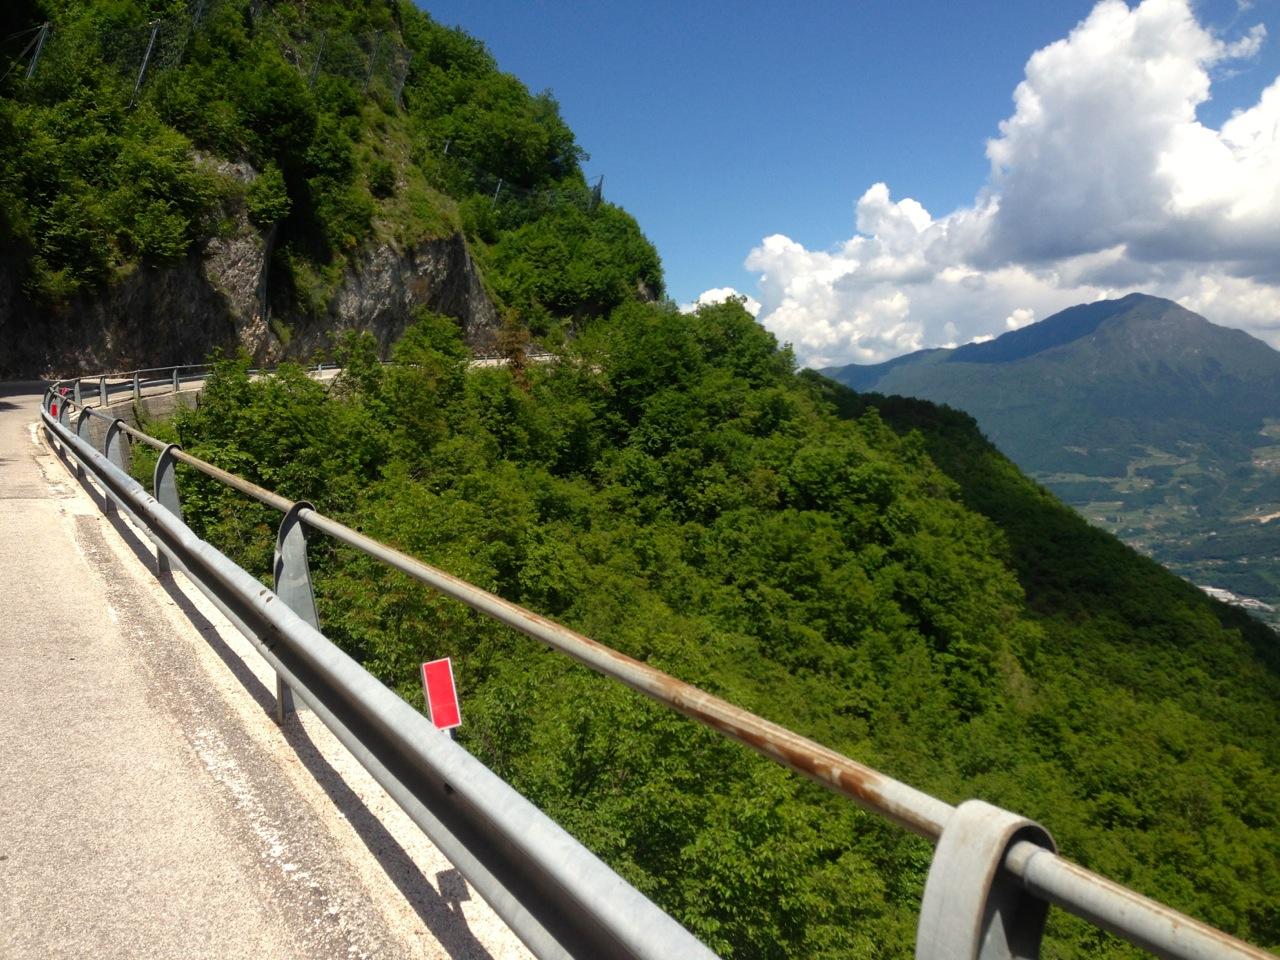 Mit dem Rennrad nach Straße nach Carniga Terme (820m)